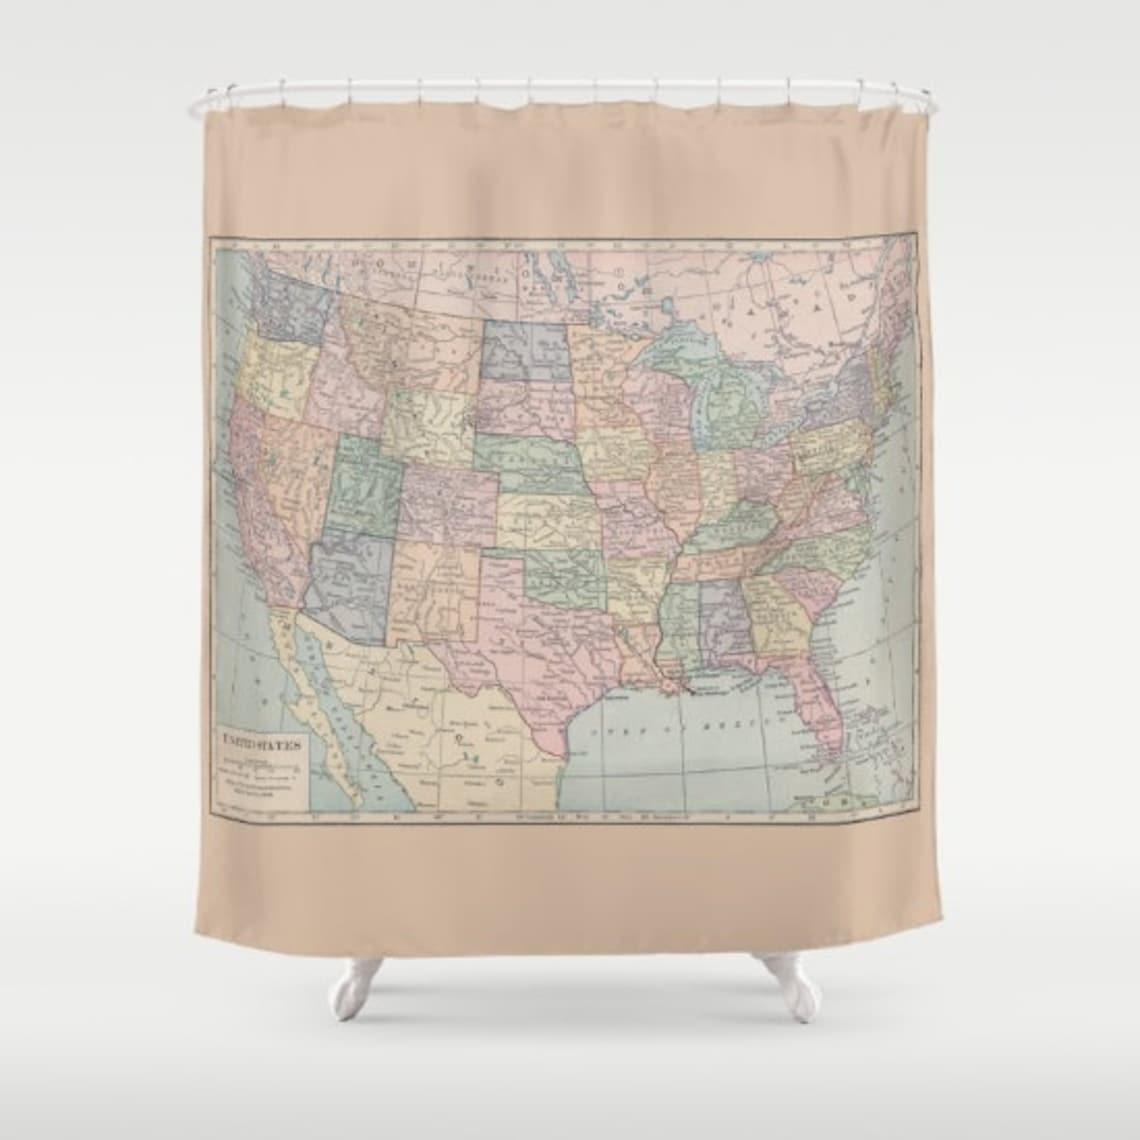 Map Shower Curtain United States Home Decor Bathroom